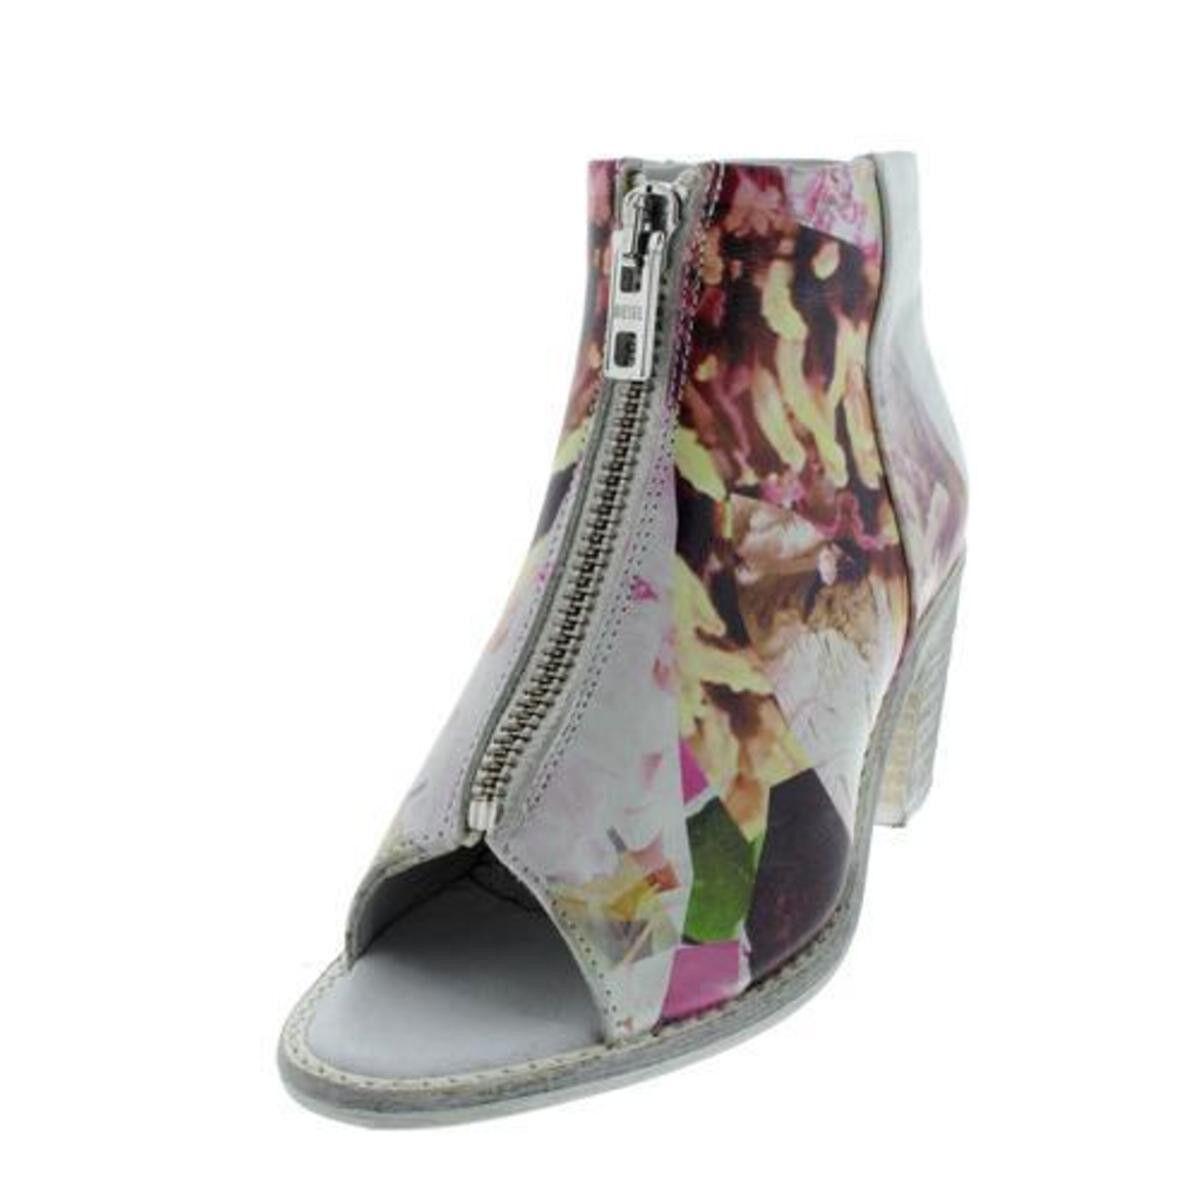 acquista online donna Chelsea Show Show Show Cox Leather Open-Toe Ankle stivali  più economico